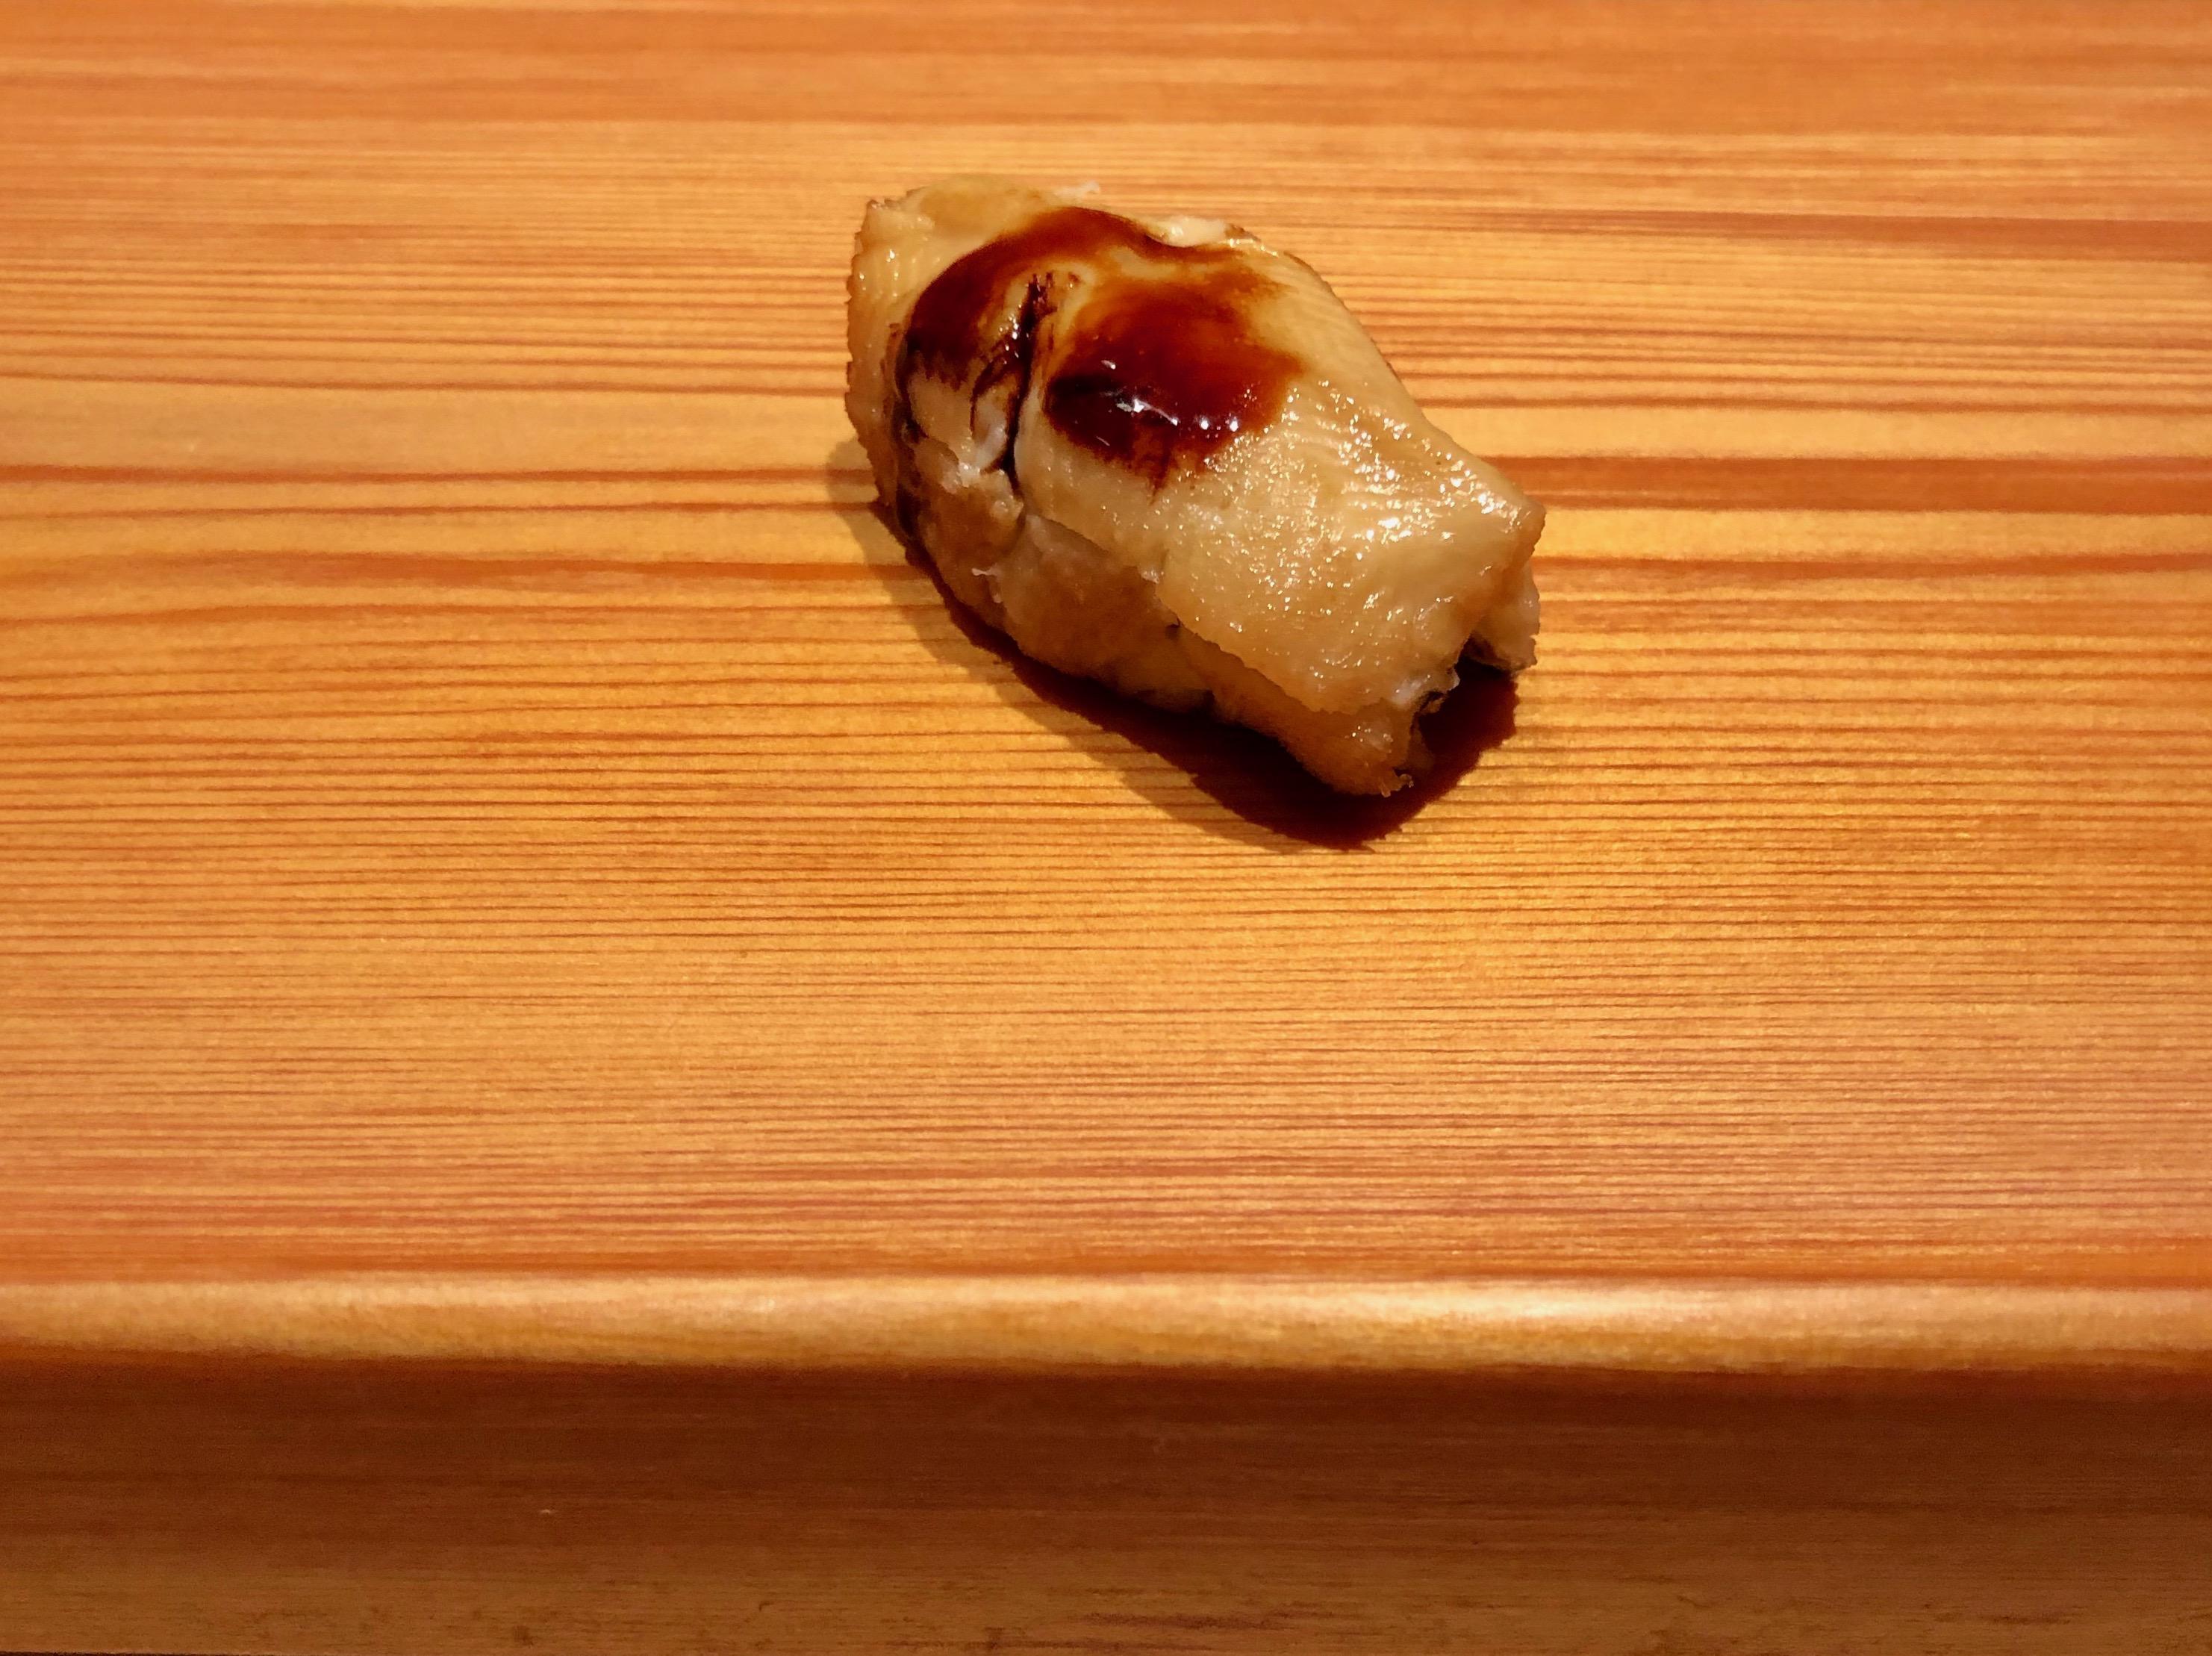 Sushi Shin unagi a.k.a. freshwater eel